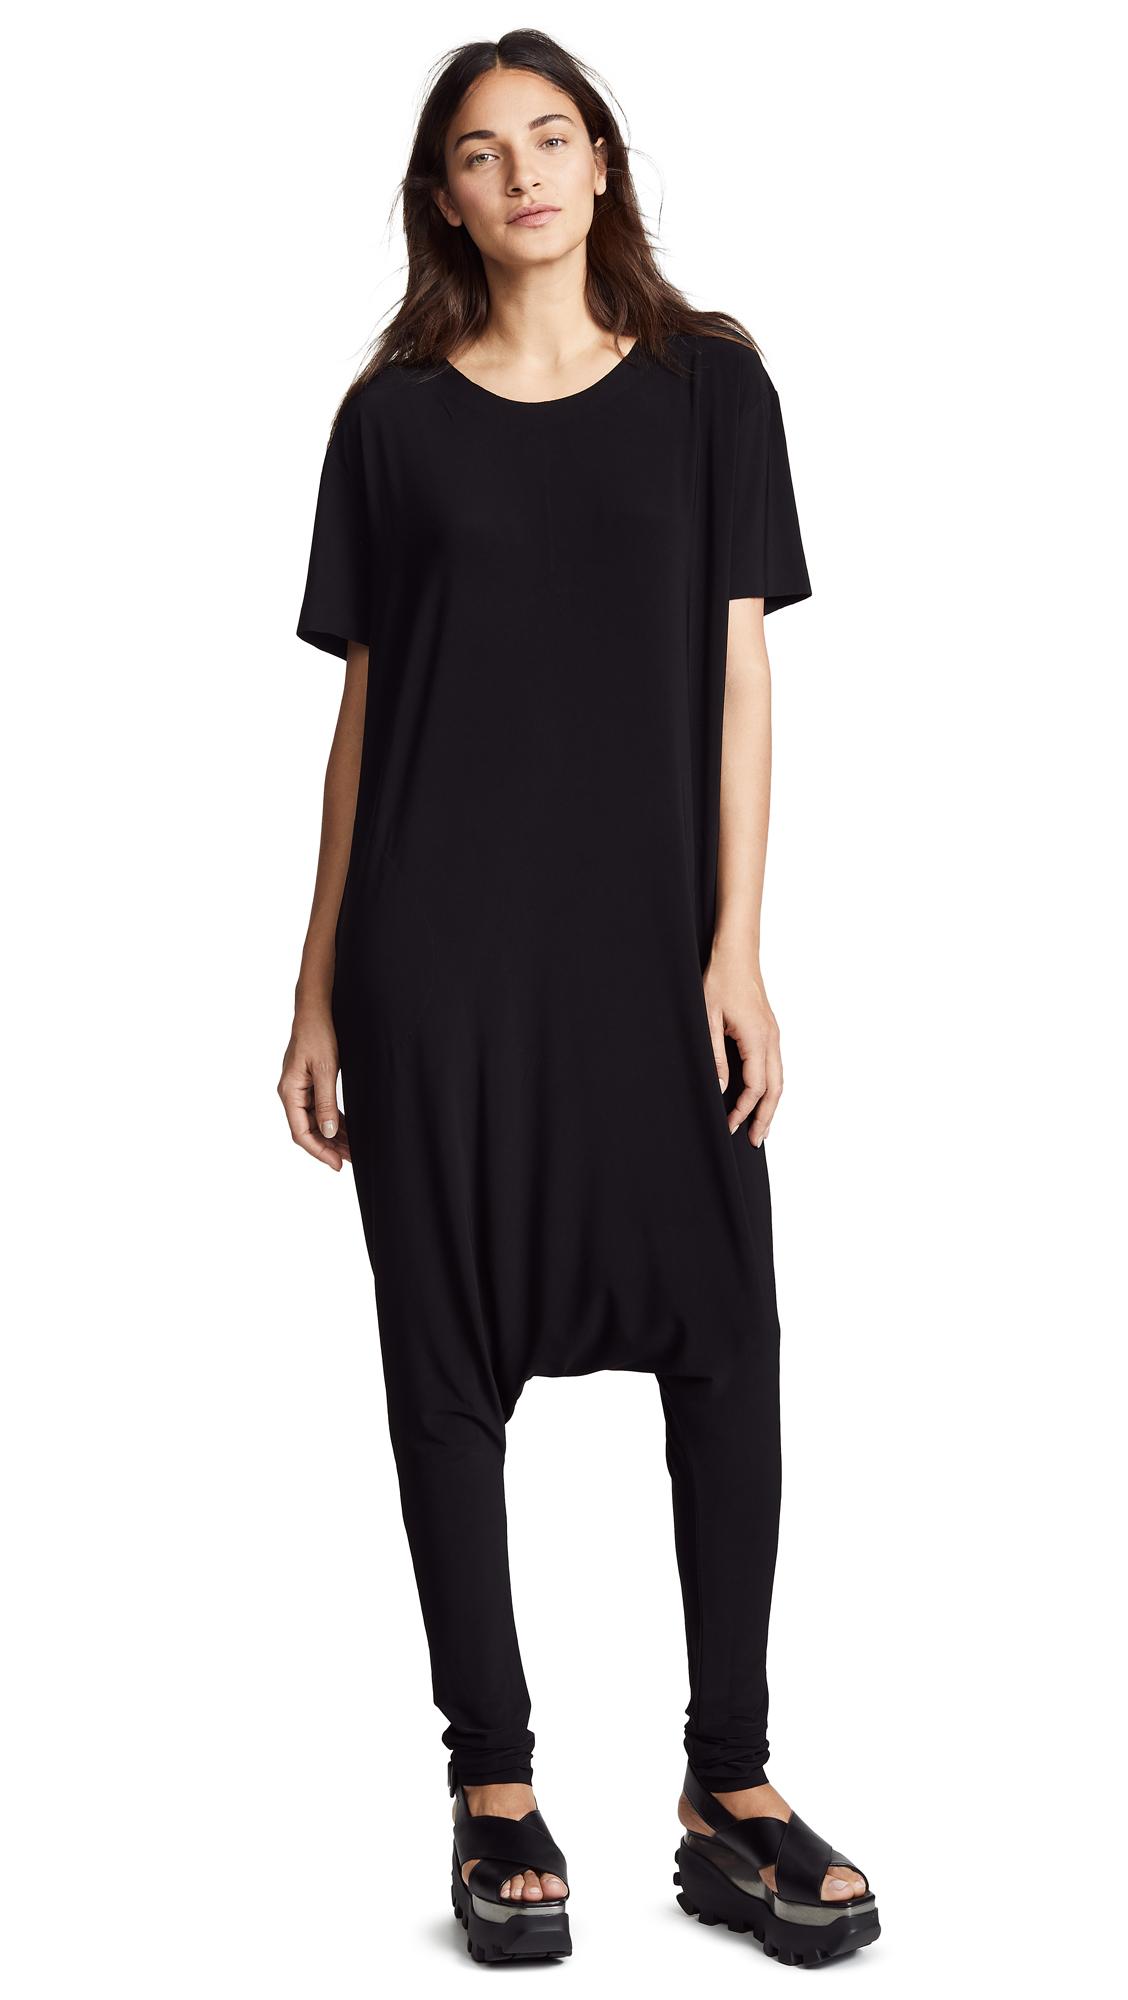 Norma Kamali Short Sleeve Dolman Jumpsuit